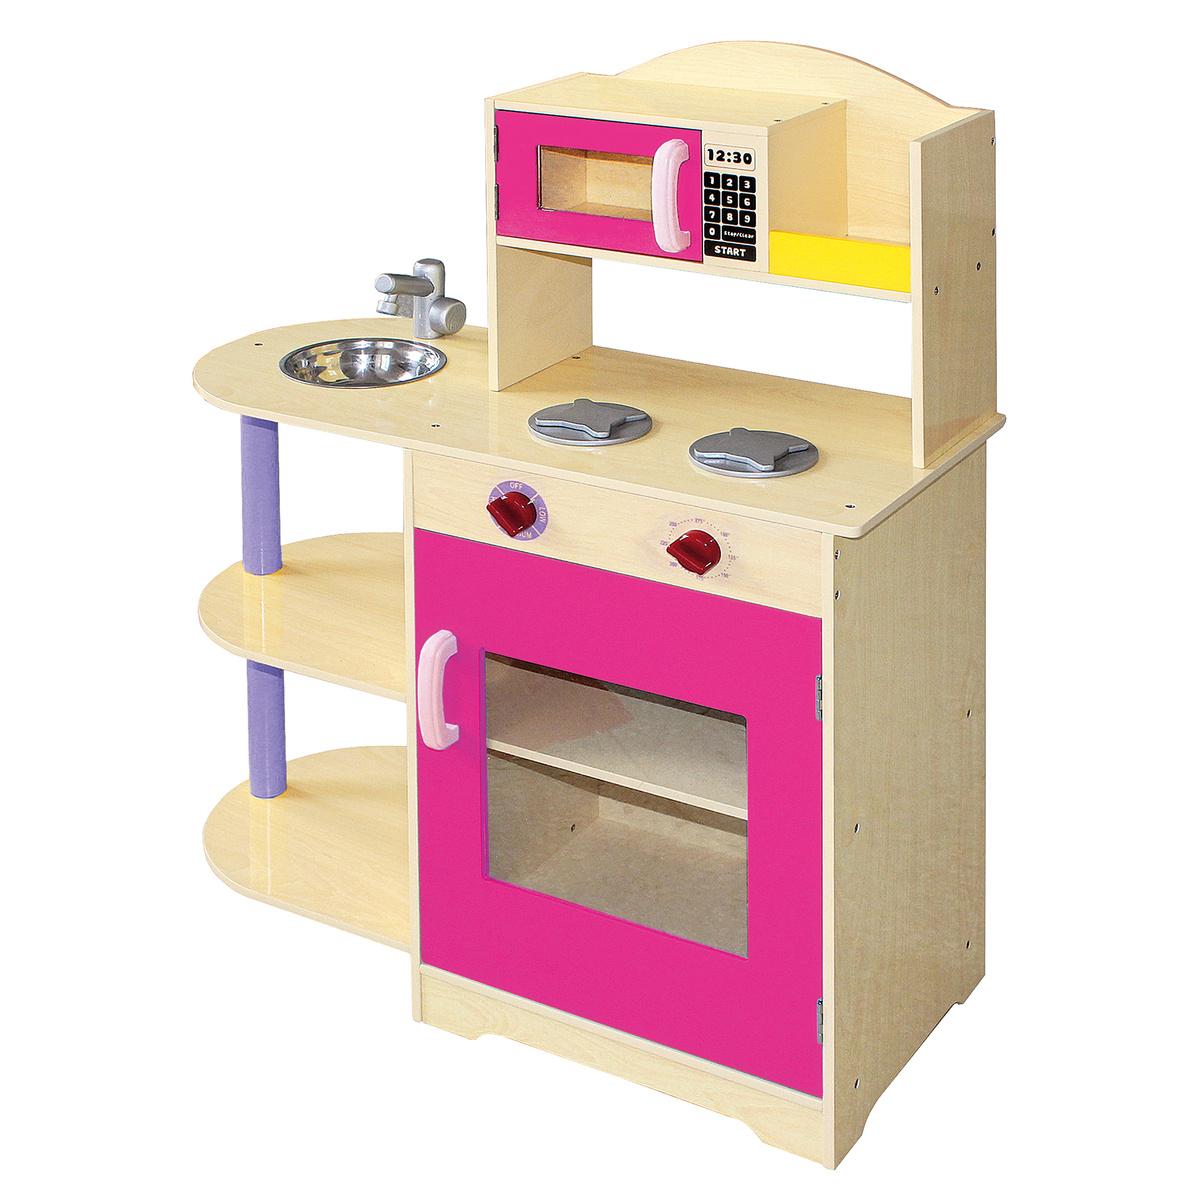 Bino Detská kuchynka s mikrovlnnou rúrou